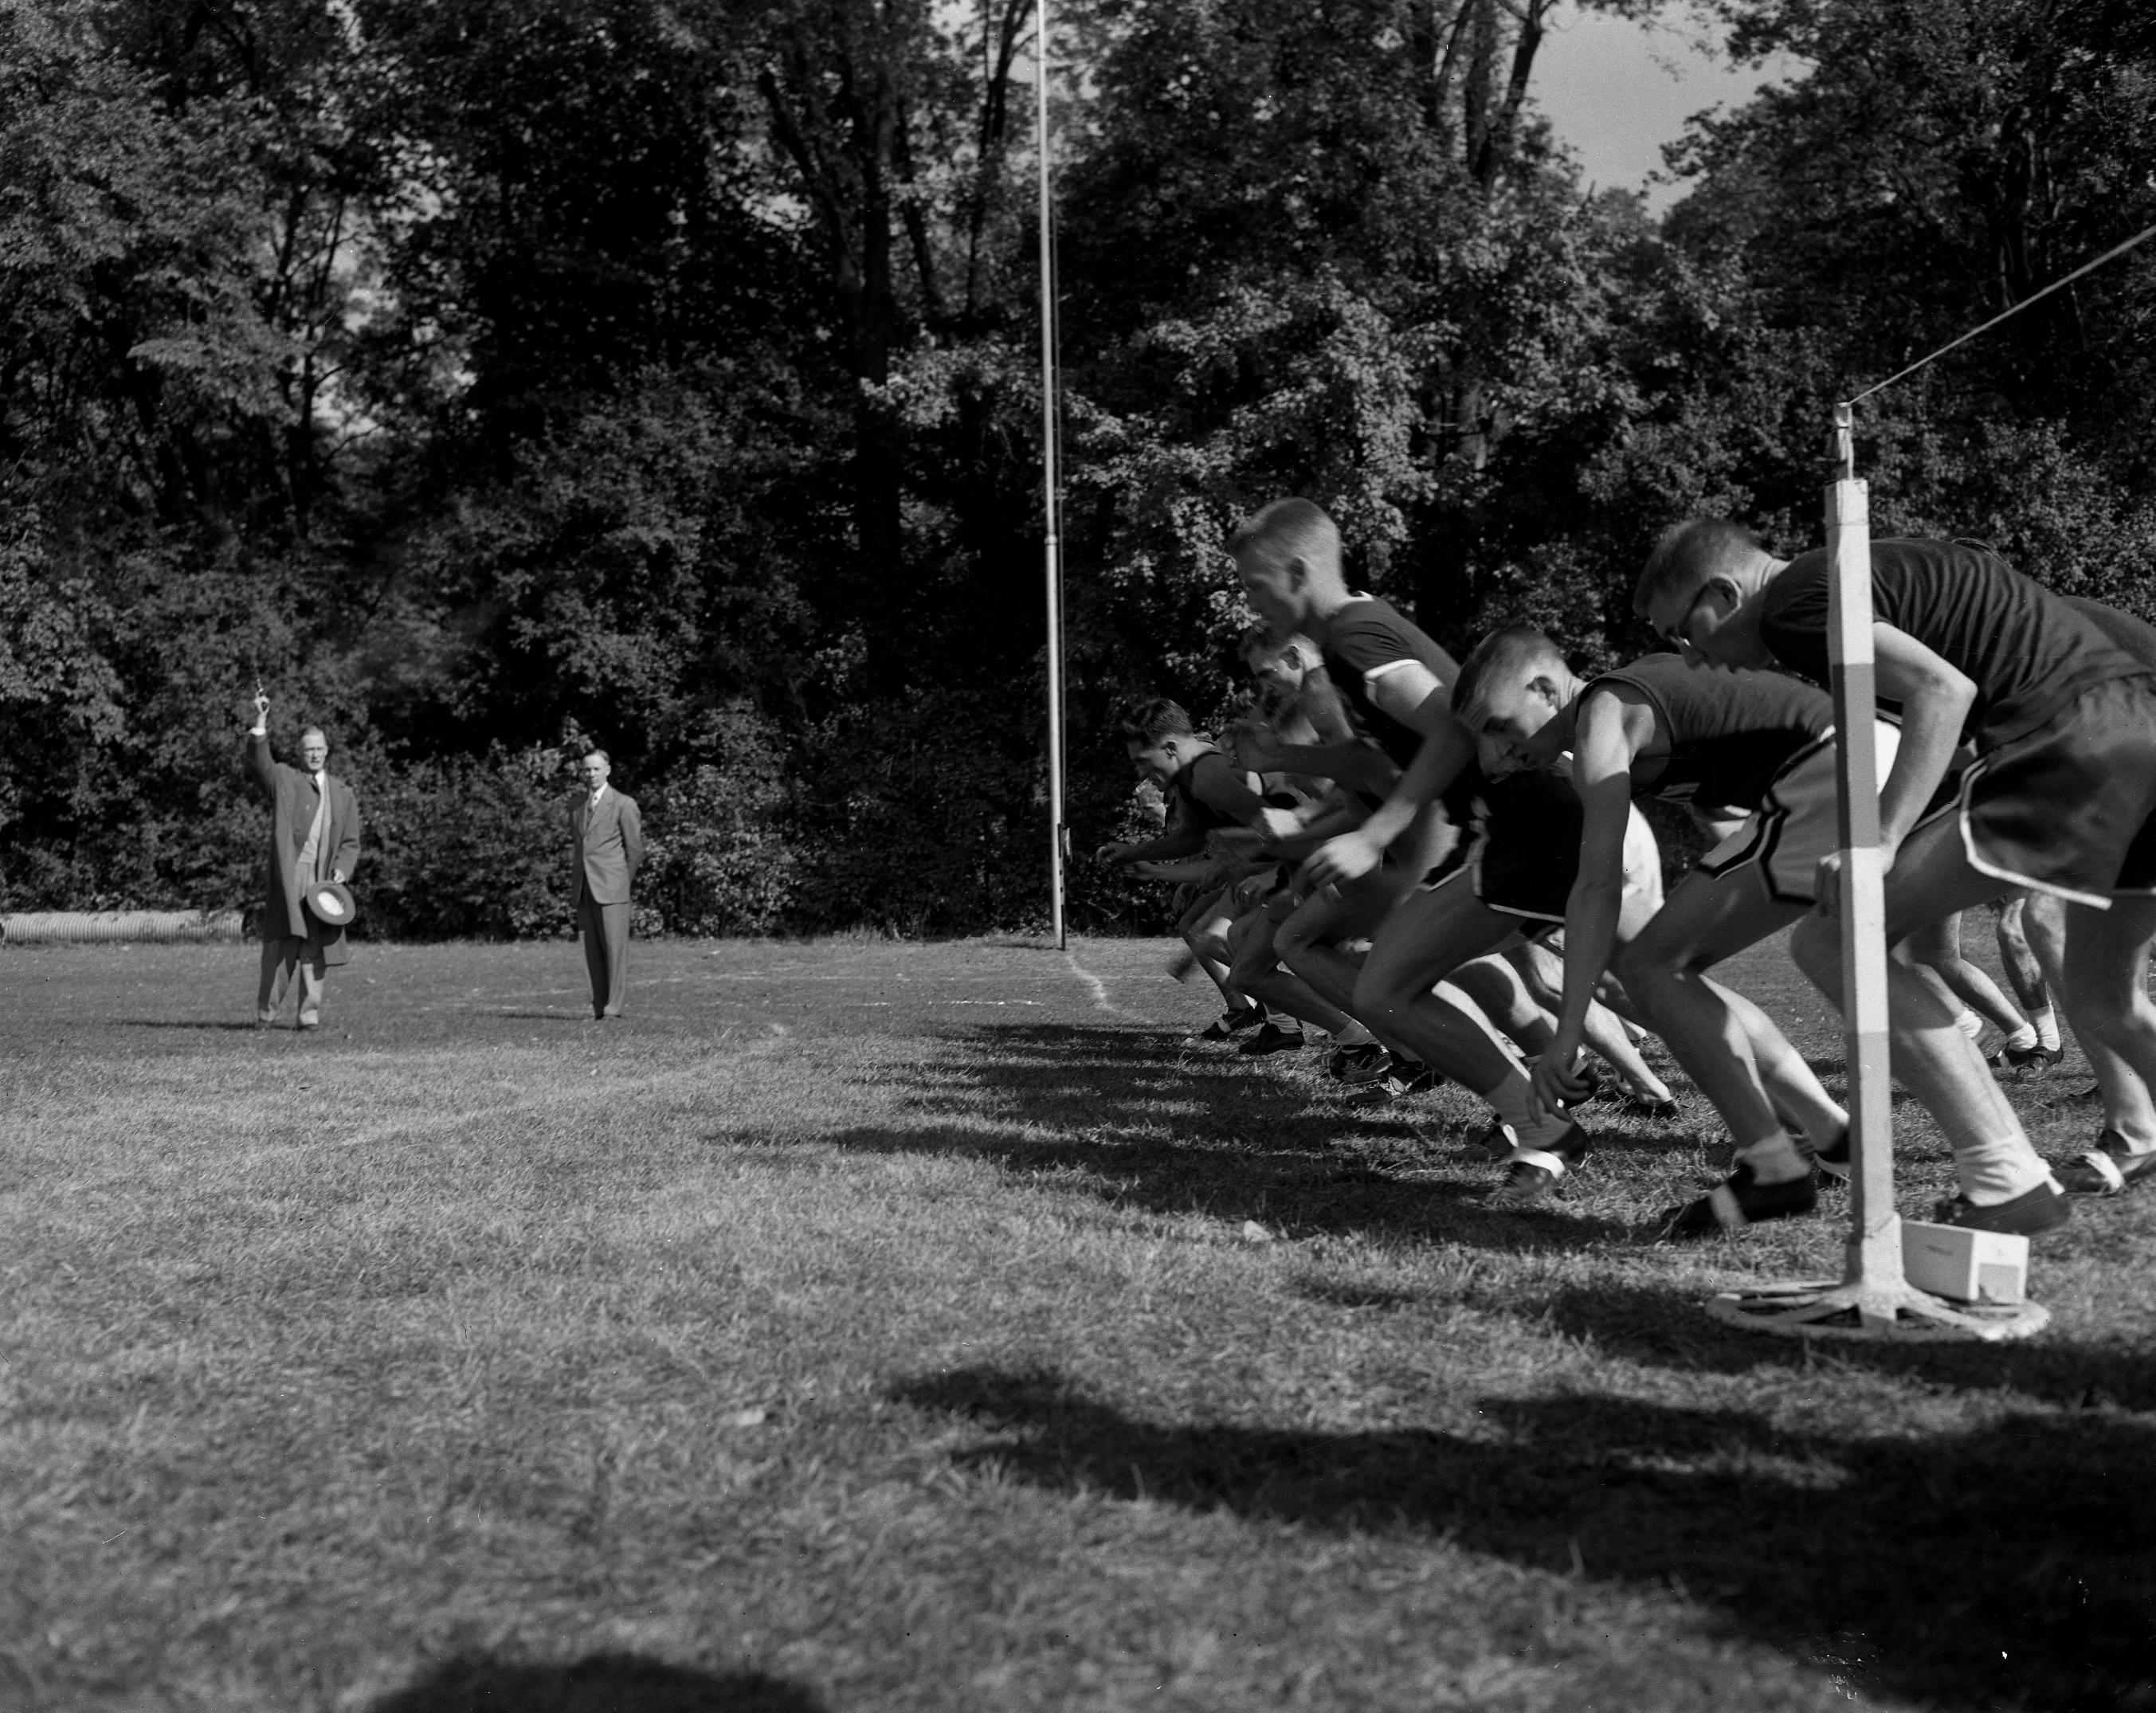 Cross Country Track Meet, 1952